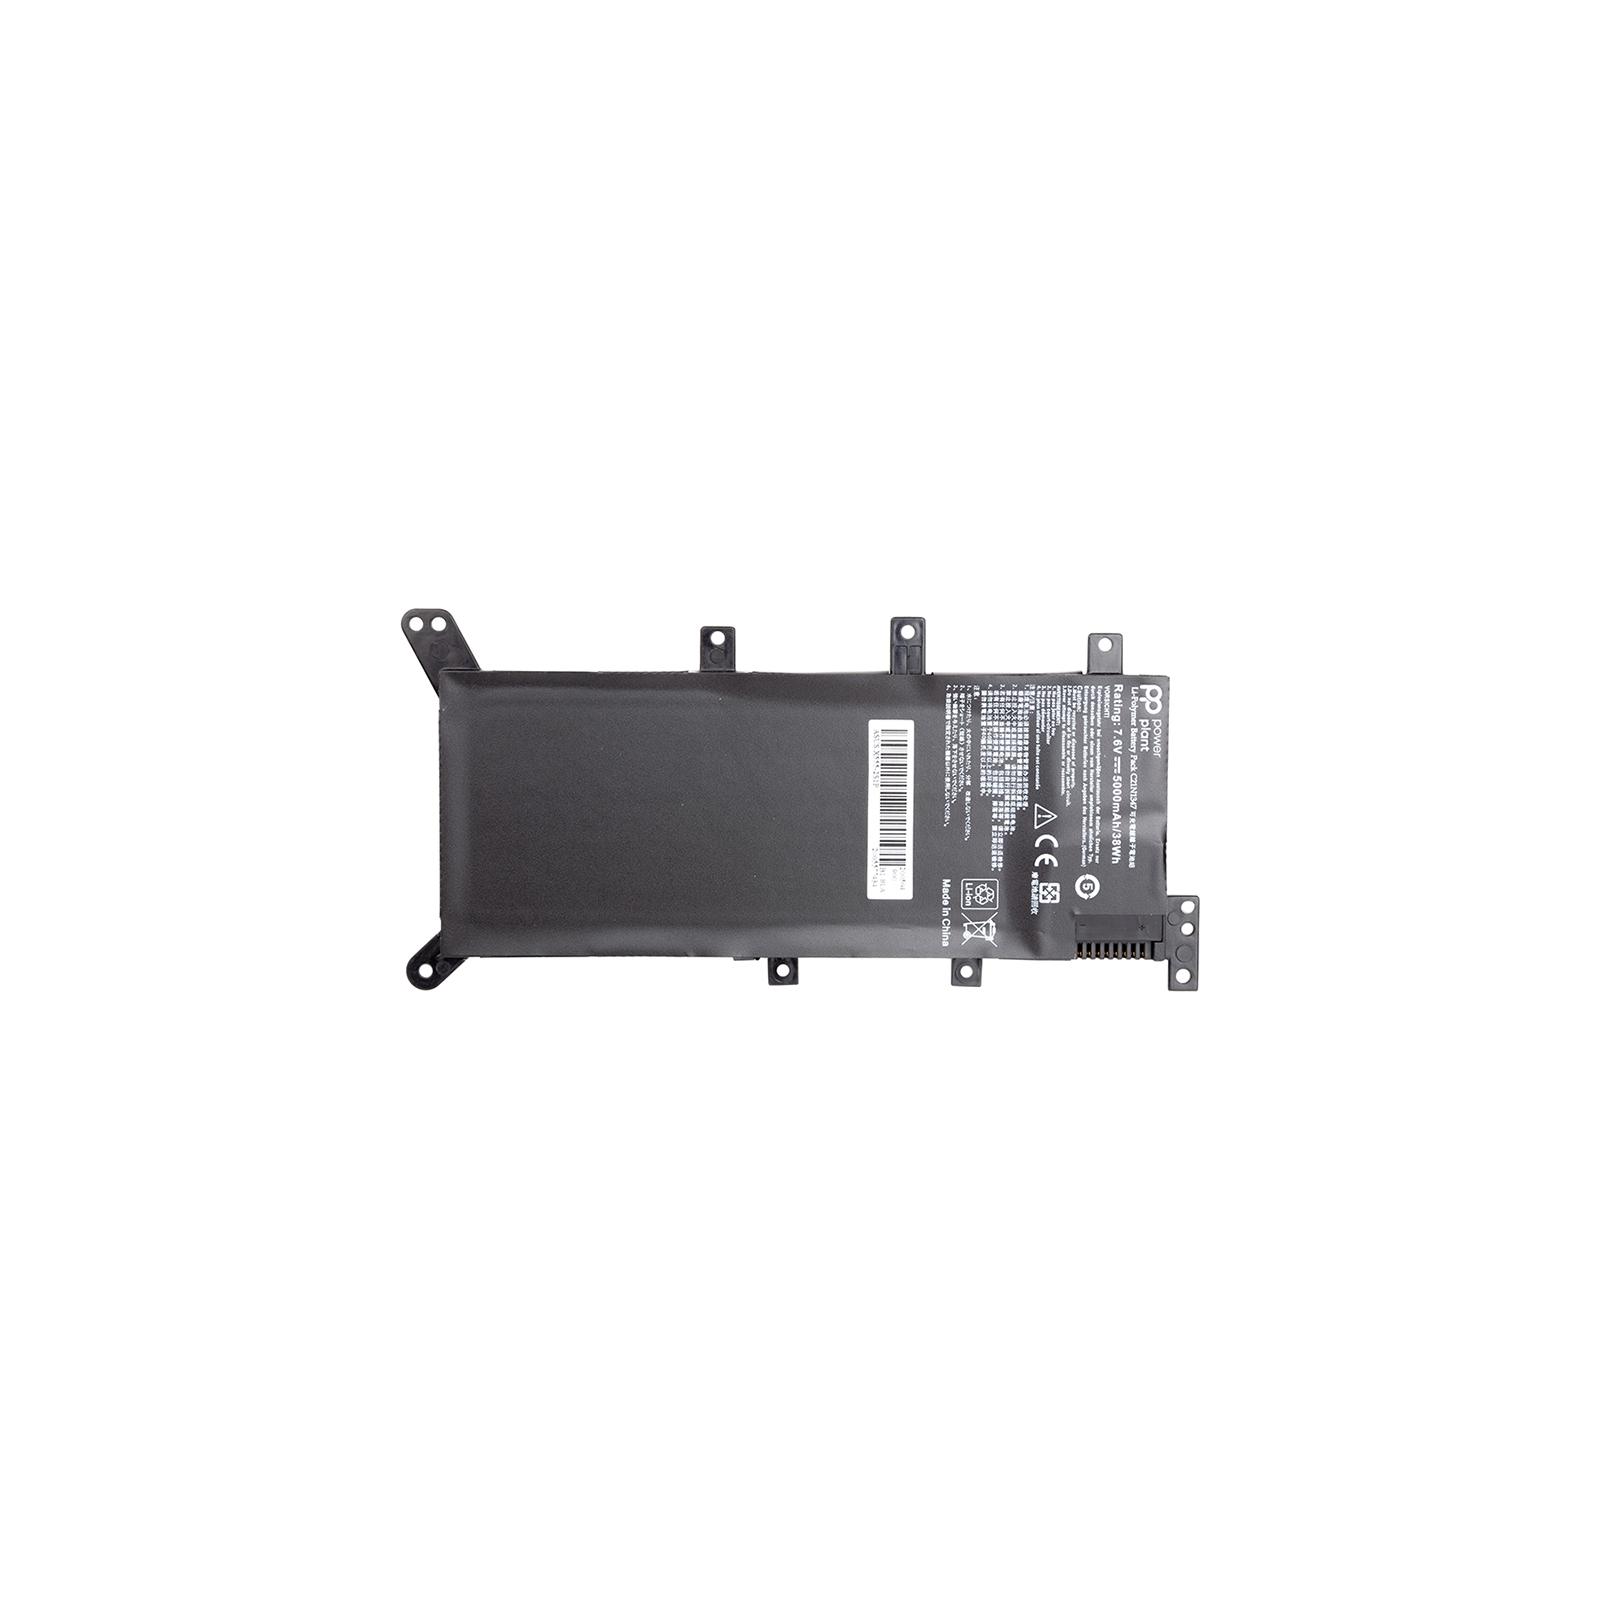 Аккумулятор для ноутбука ASUS X555 Series (C21N1347) 7.5V 5000mAh PowerPlant (NB430796)